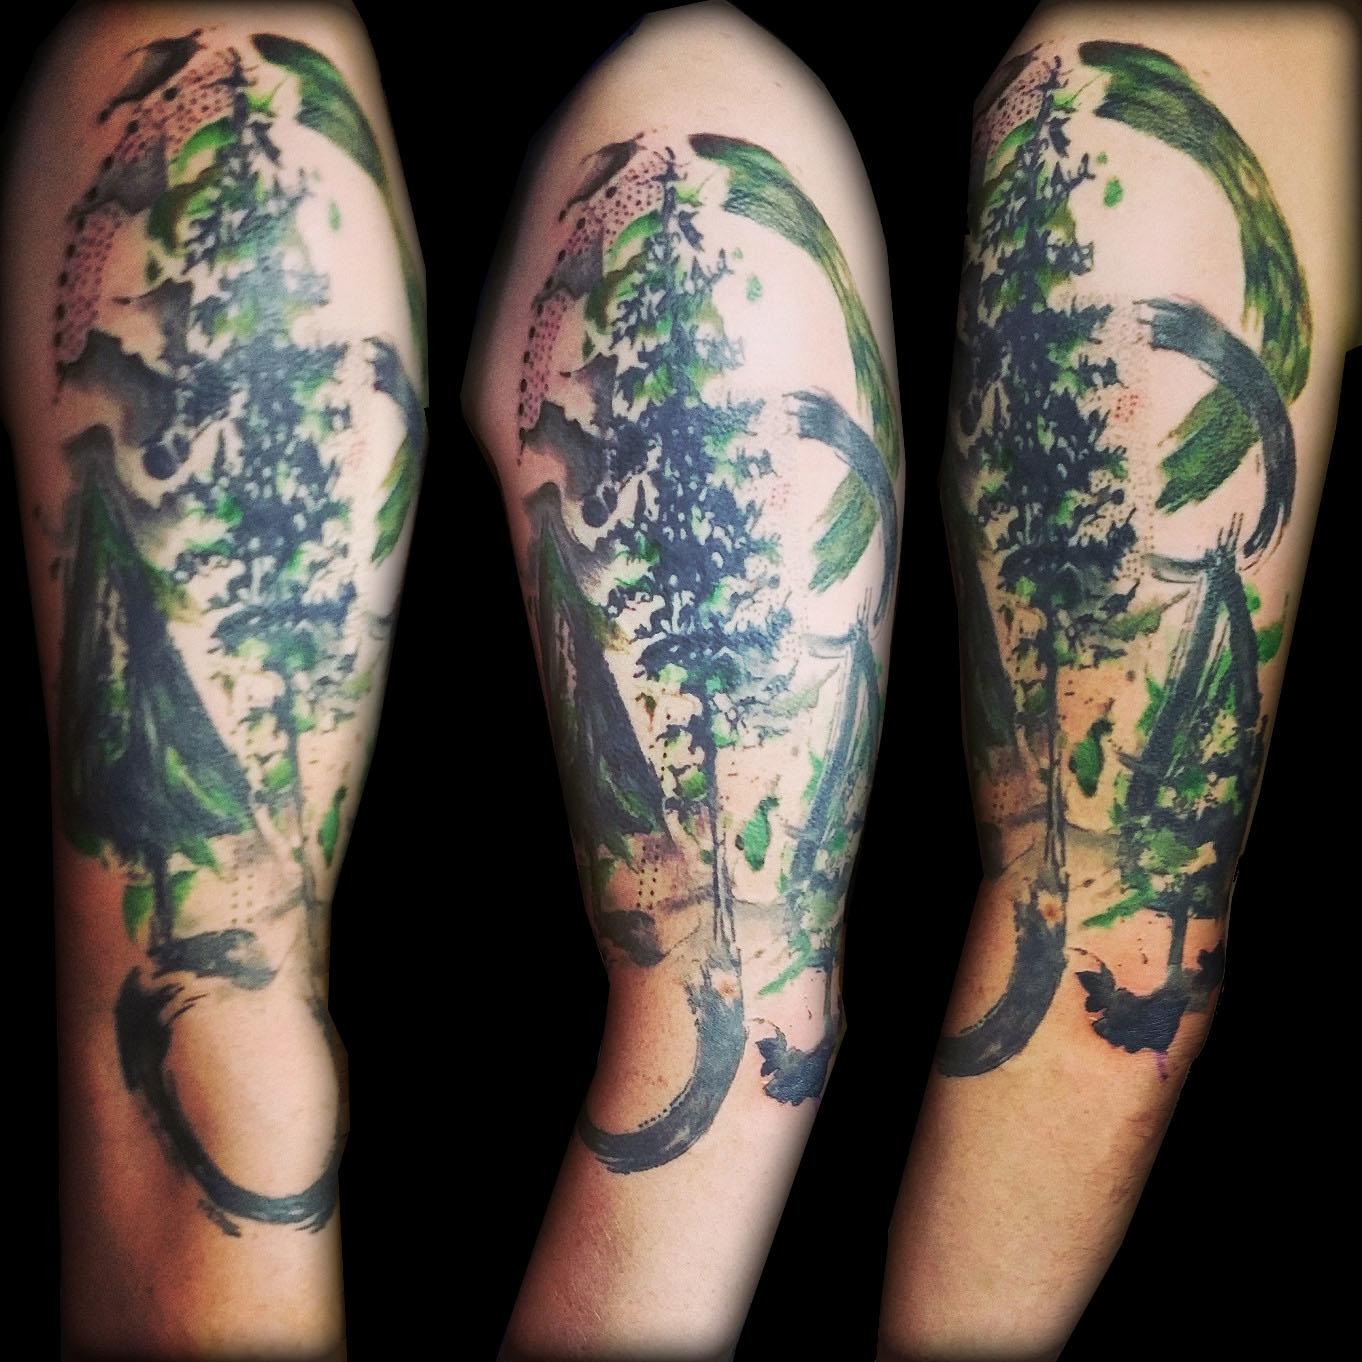 Minneapolis Tattoo Shop image 13